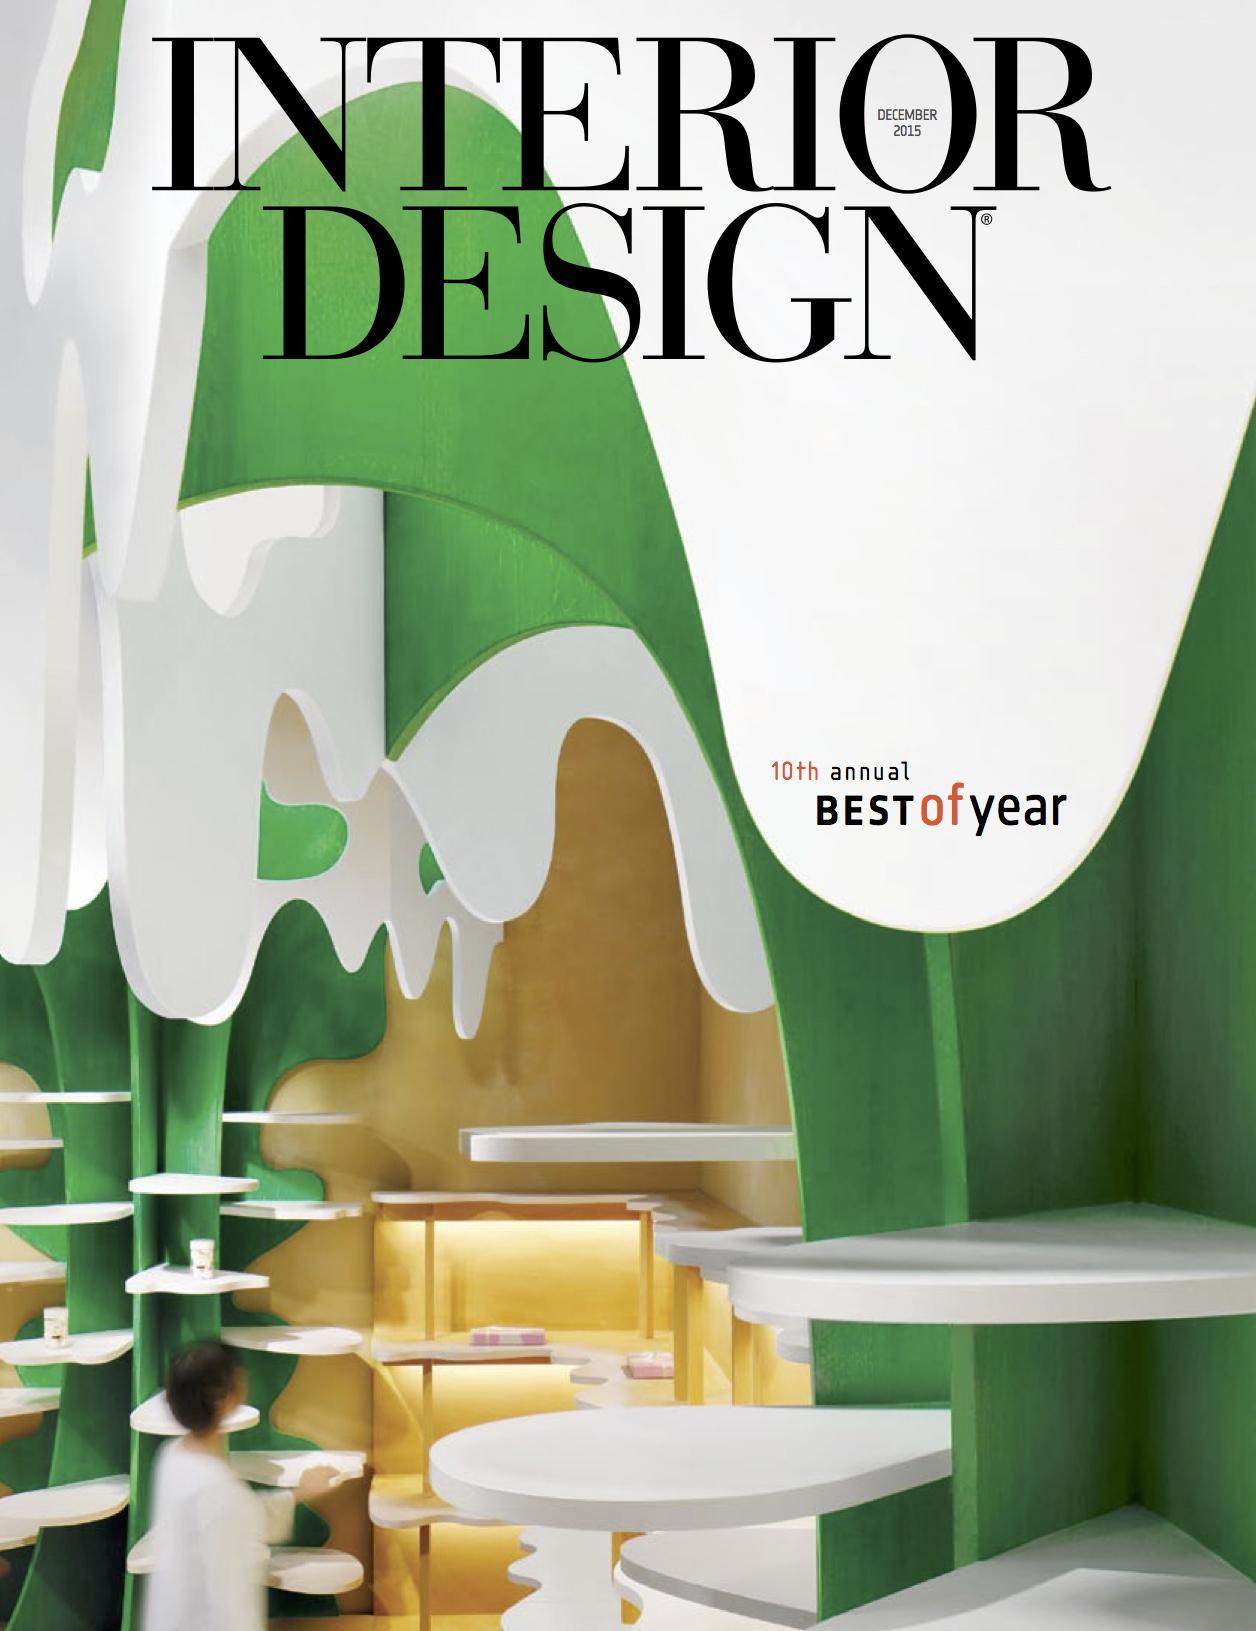 Interior Design Magazine - December 2015 - BOY - JB.jpg